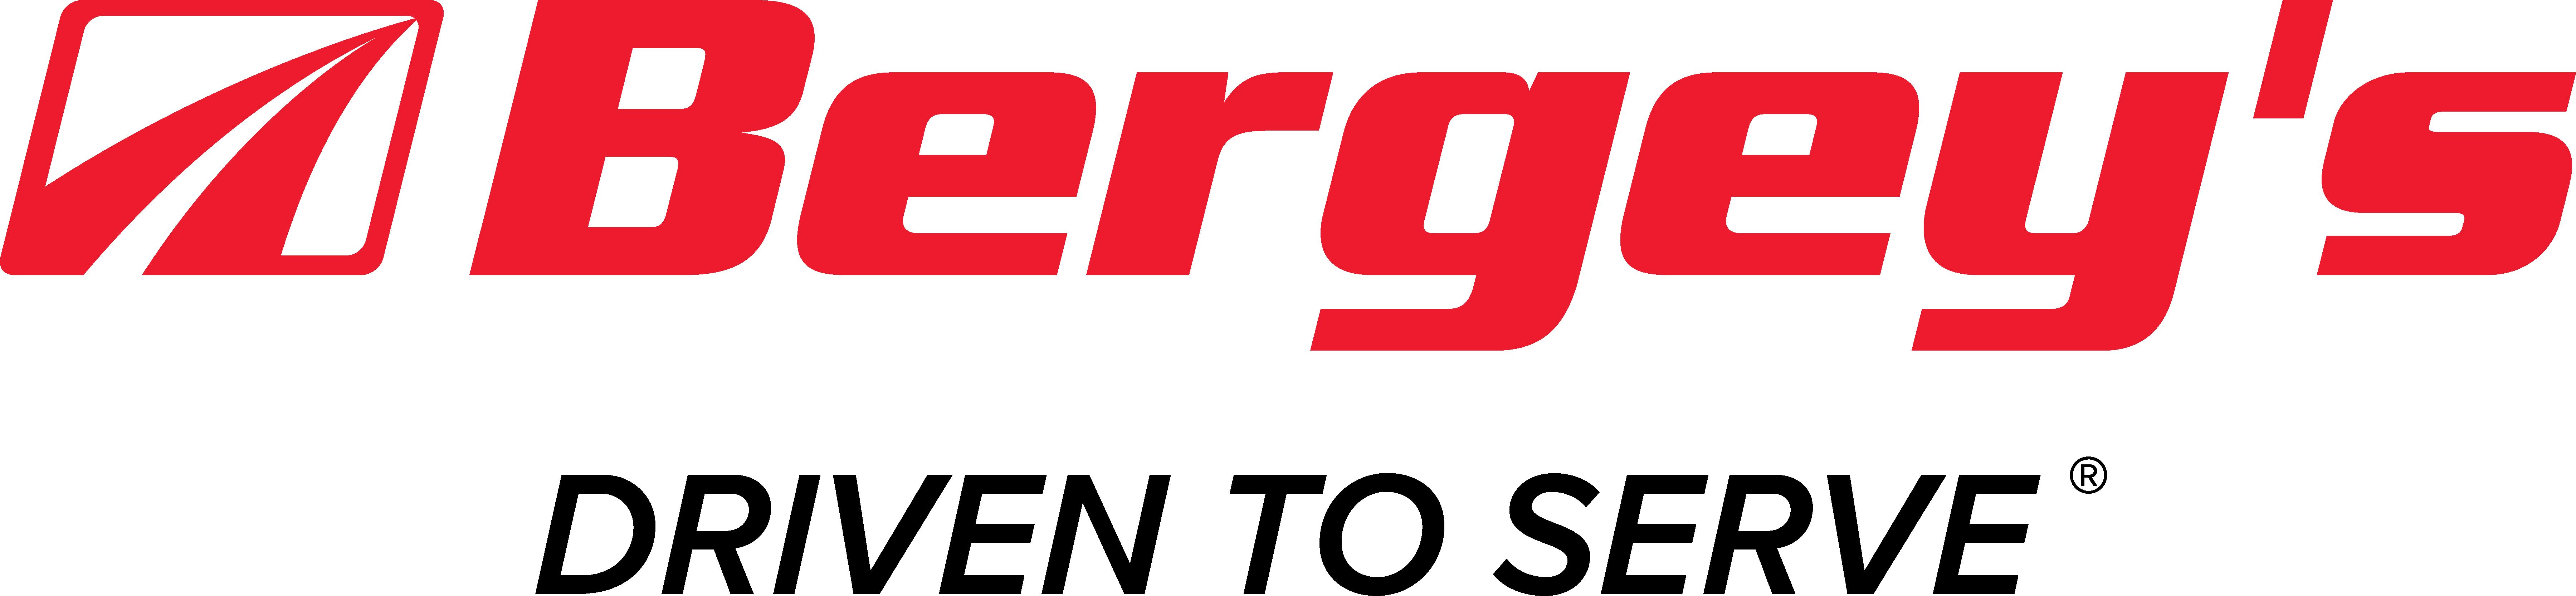 Sponsors / Bergeys_wLogo_DTS_RedBlack_V1.2_semibold_reg.png